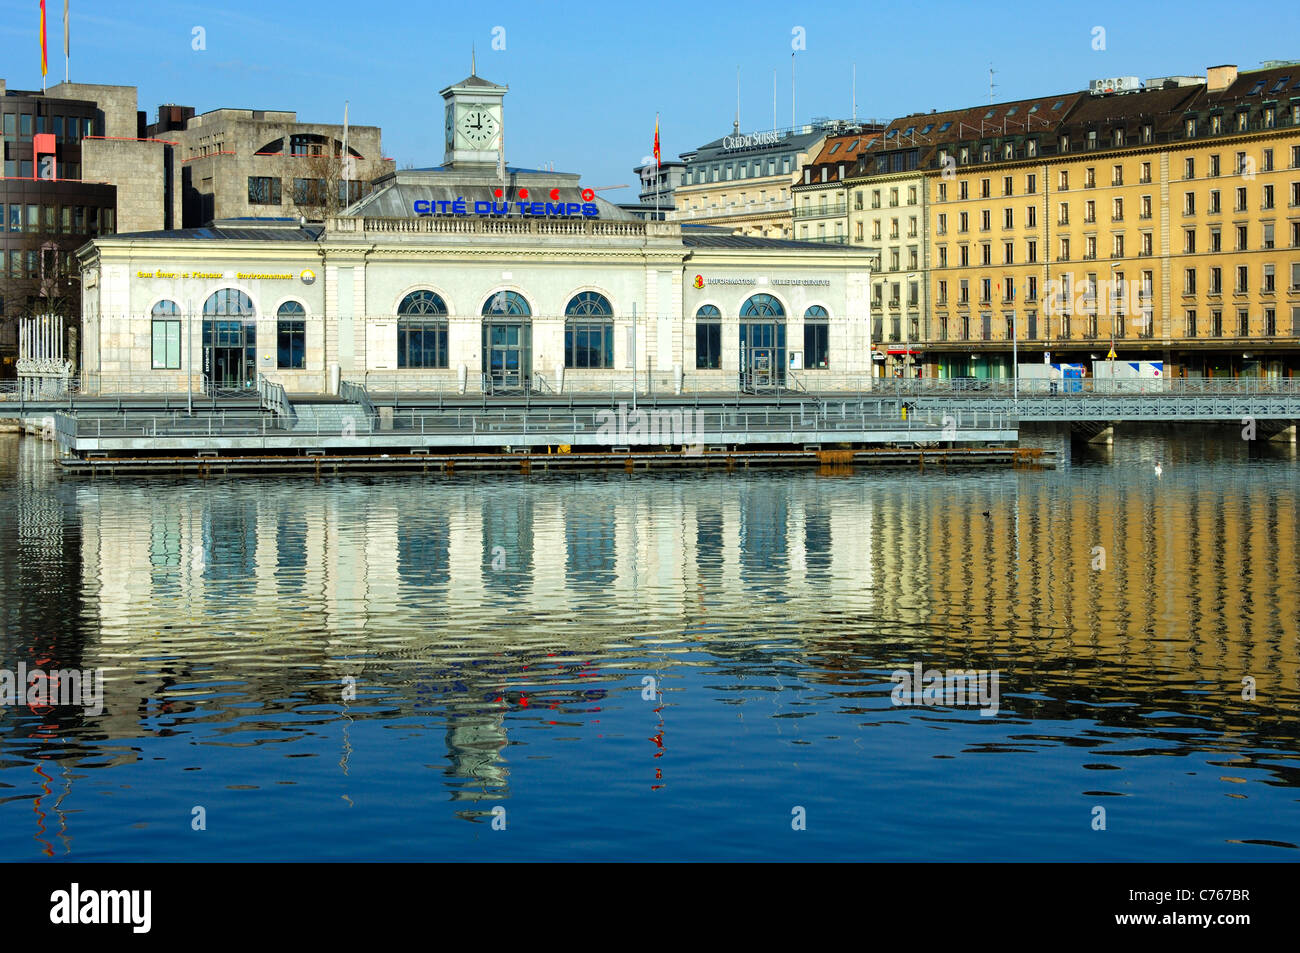 Exhibition center Cité du Temps on the bridge Pont de la machine at Lake Geneva, Geneva, SwitzerlandSwitzerland - Stock Image